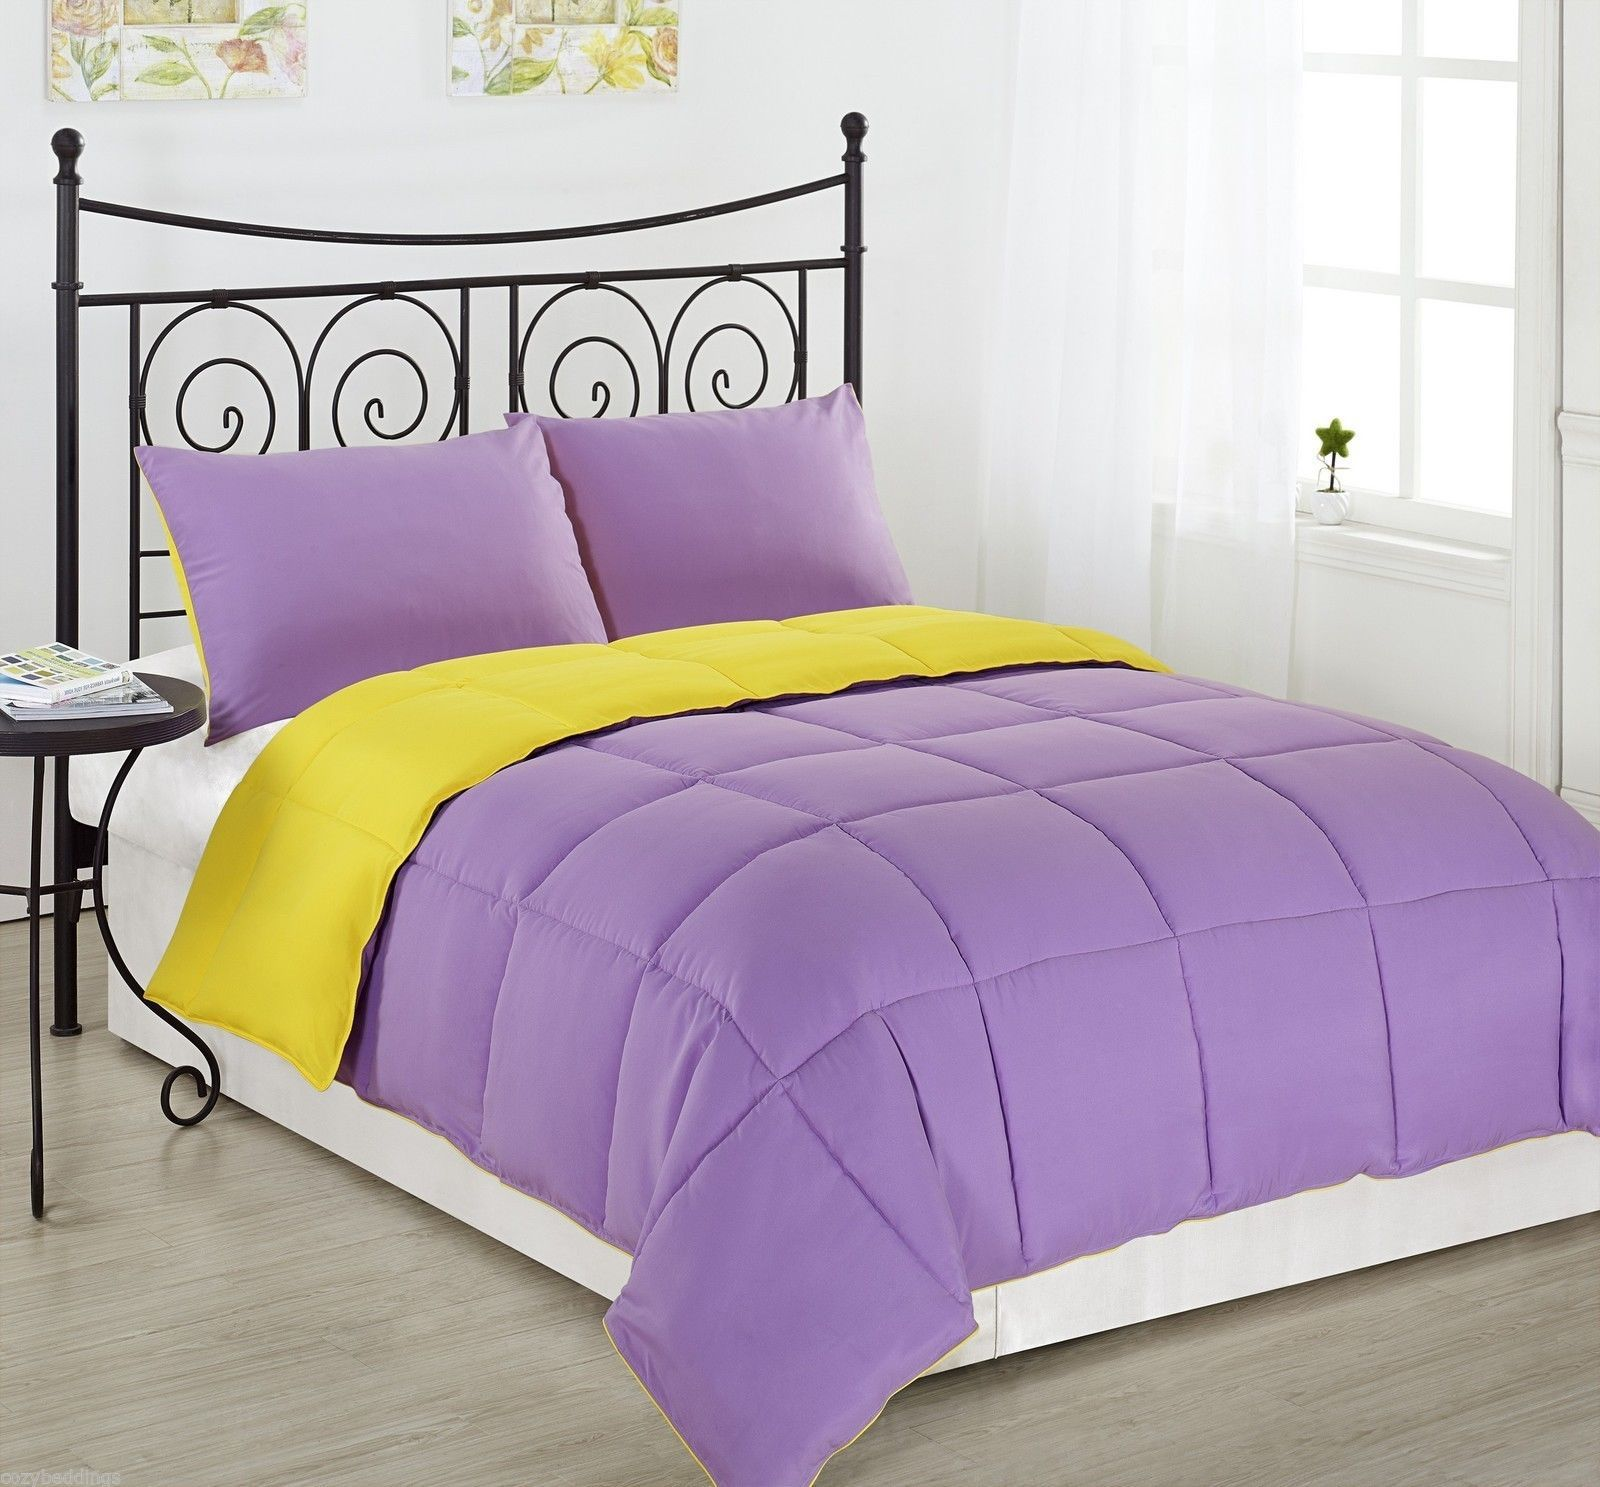 bedspreads full size under